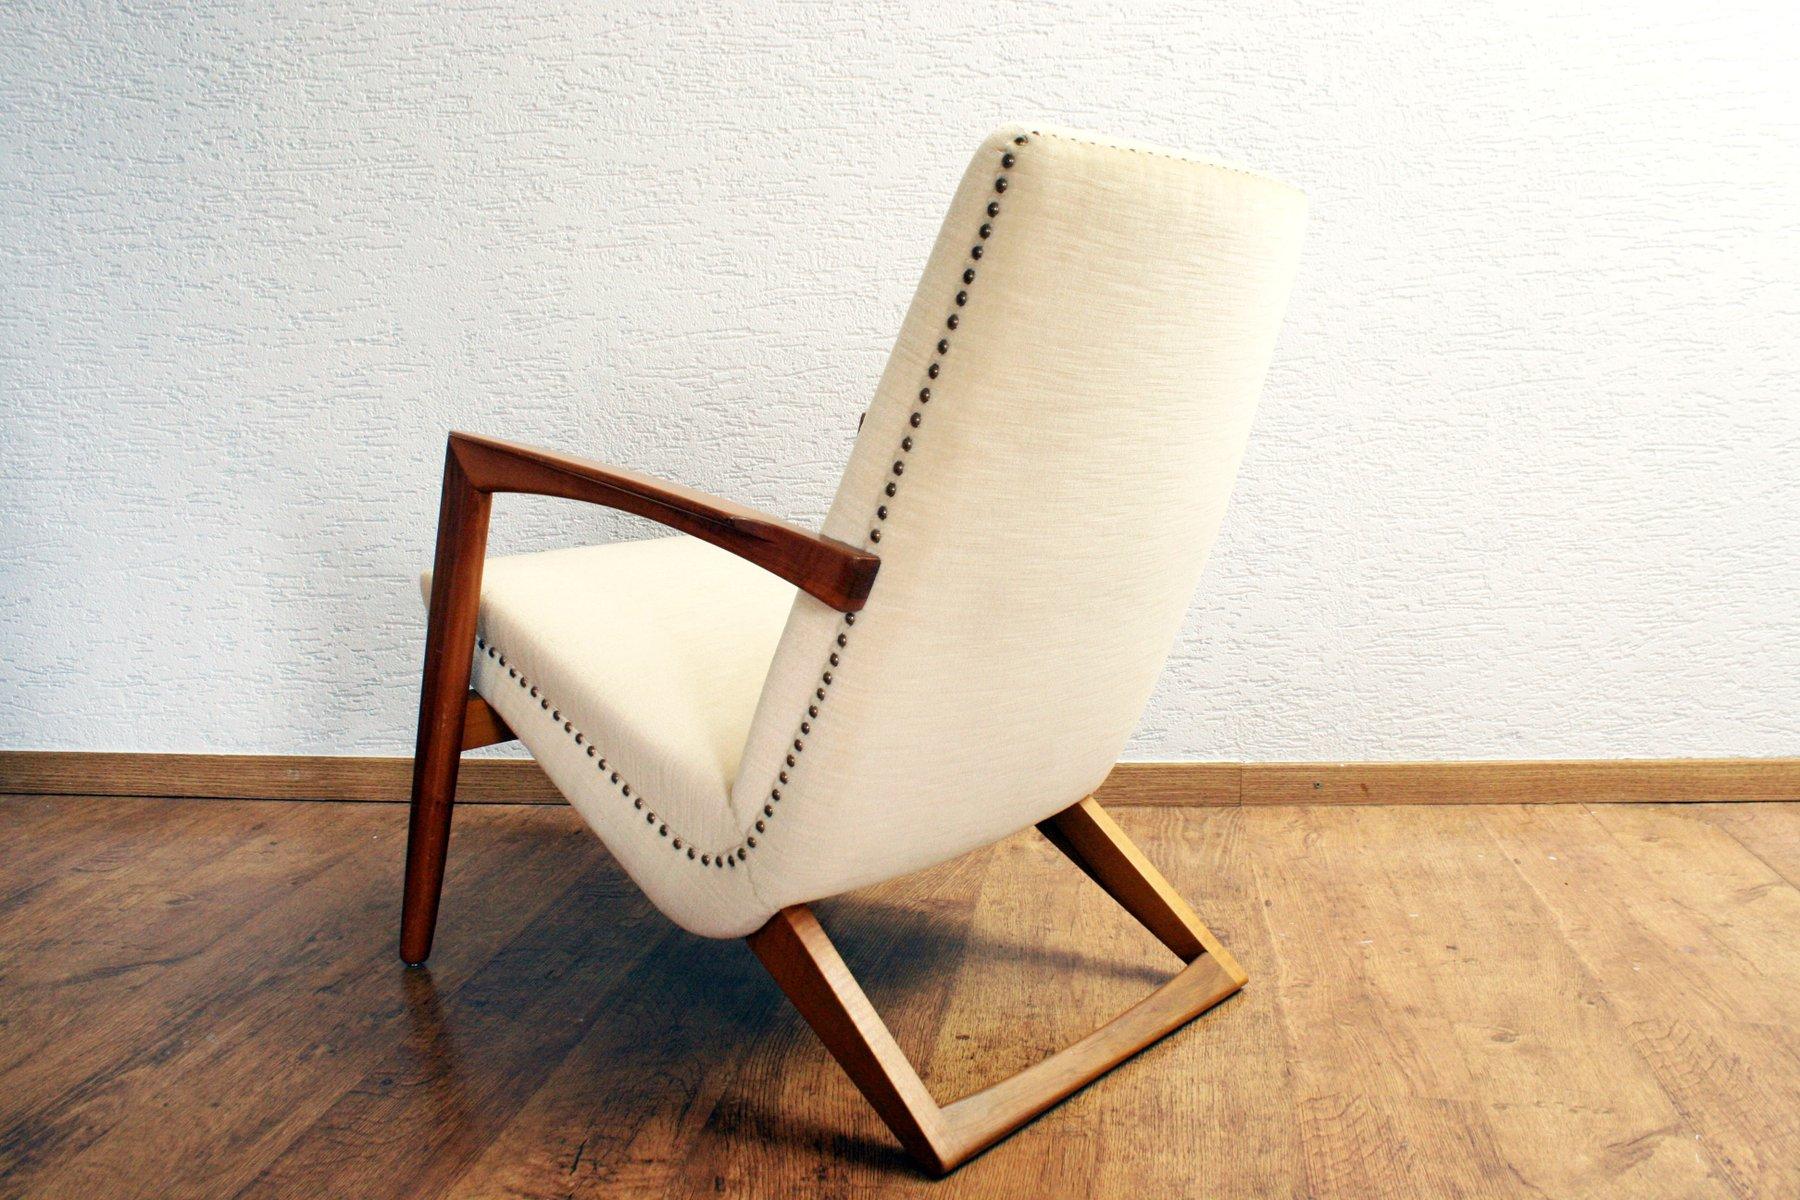 skandinavischer sessel badezimmer schlafzimmer sessel m bel design ideen. Black Bedroom Furniture Sets. Home Design Ideas